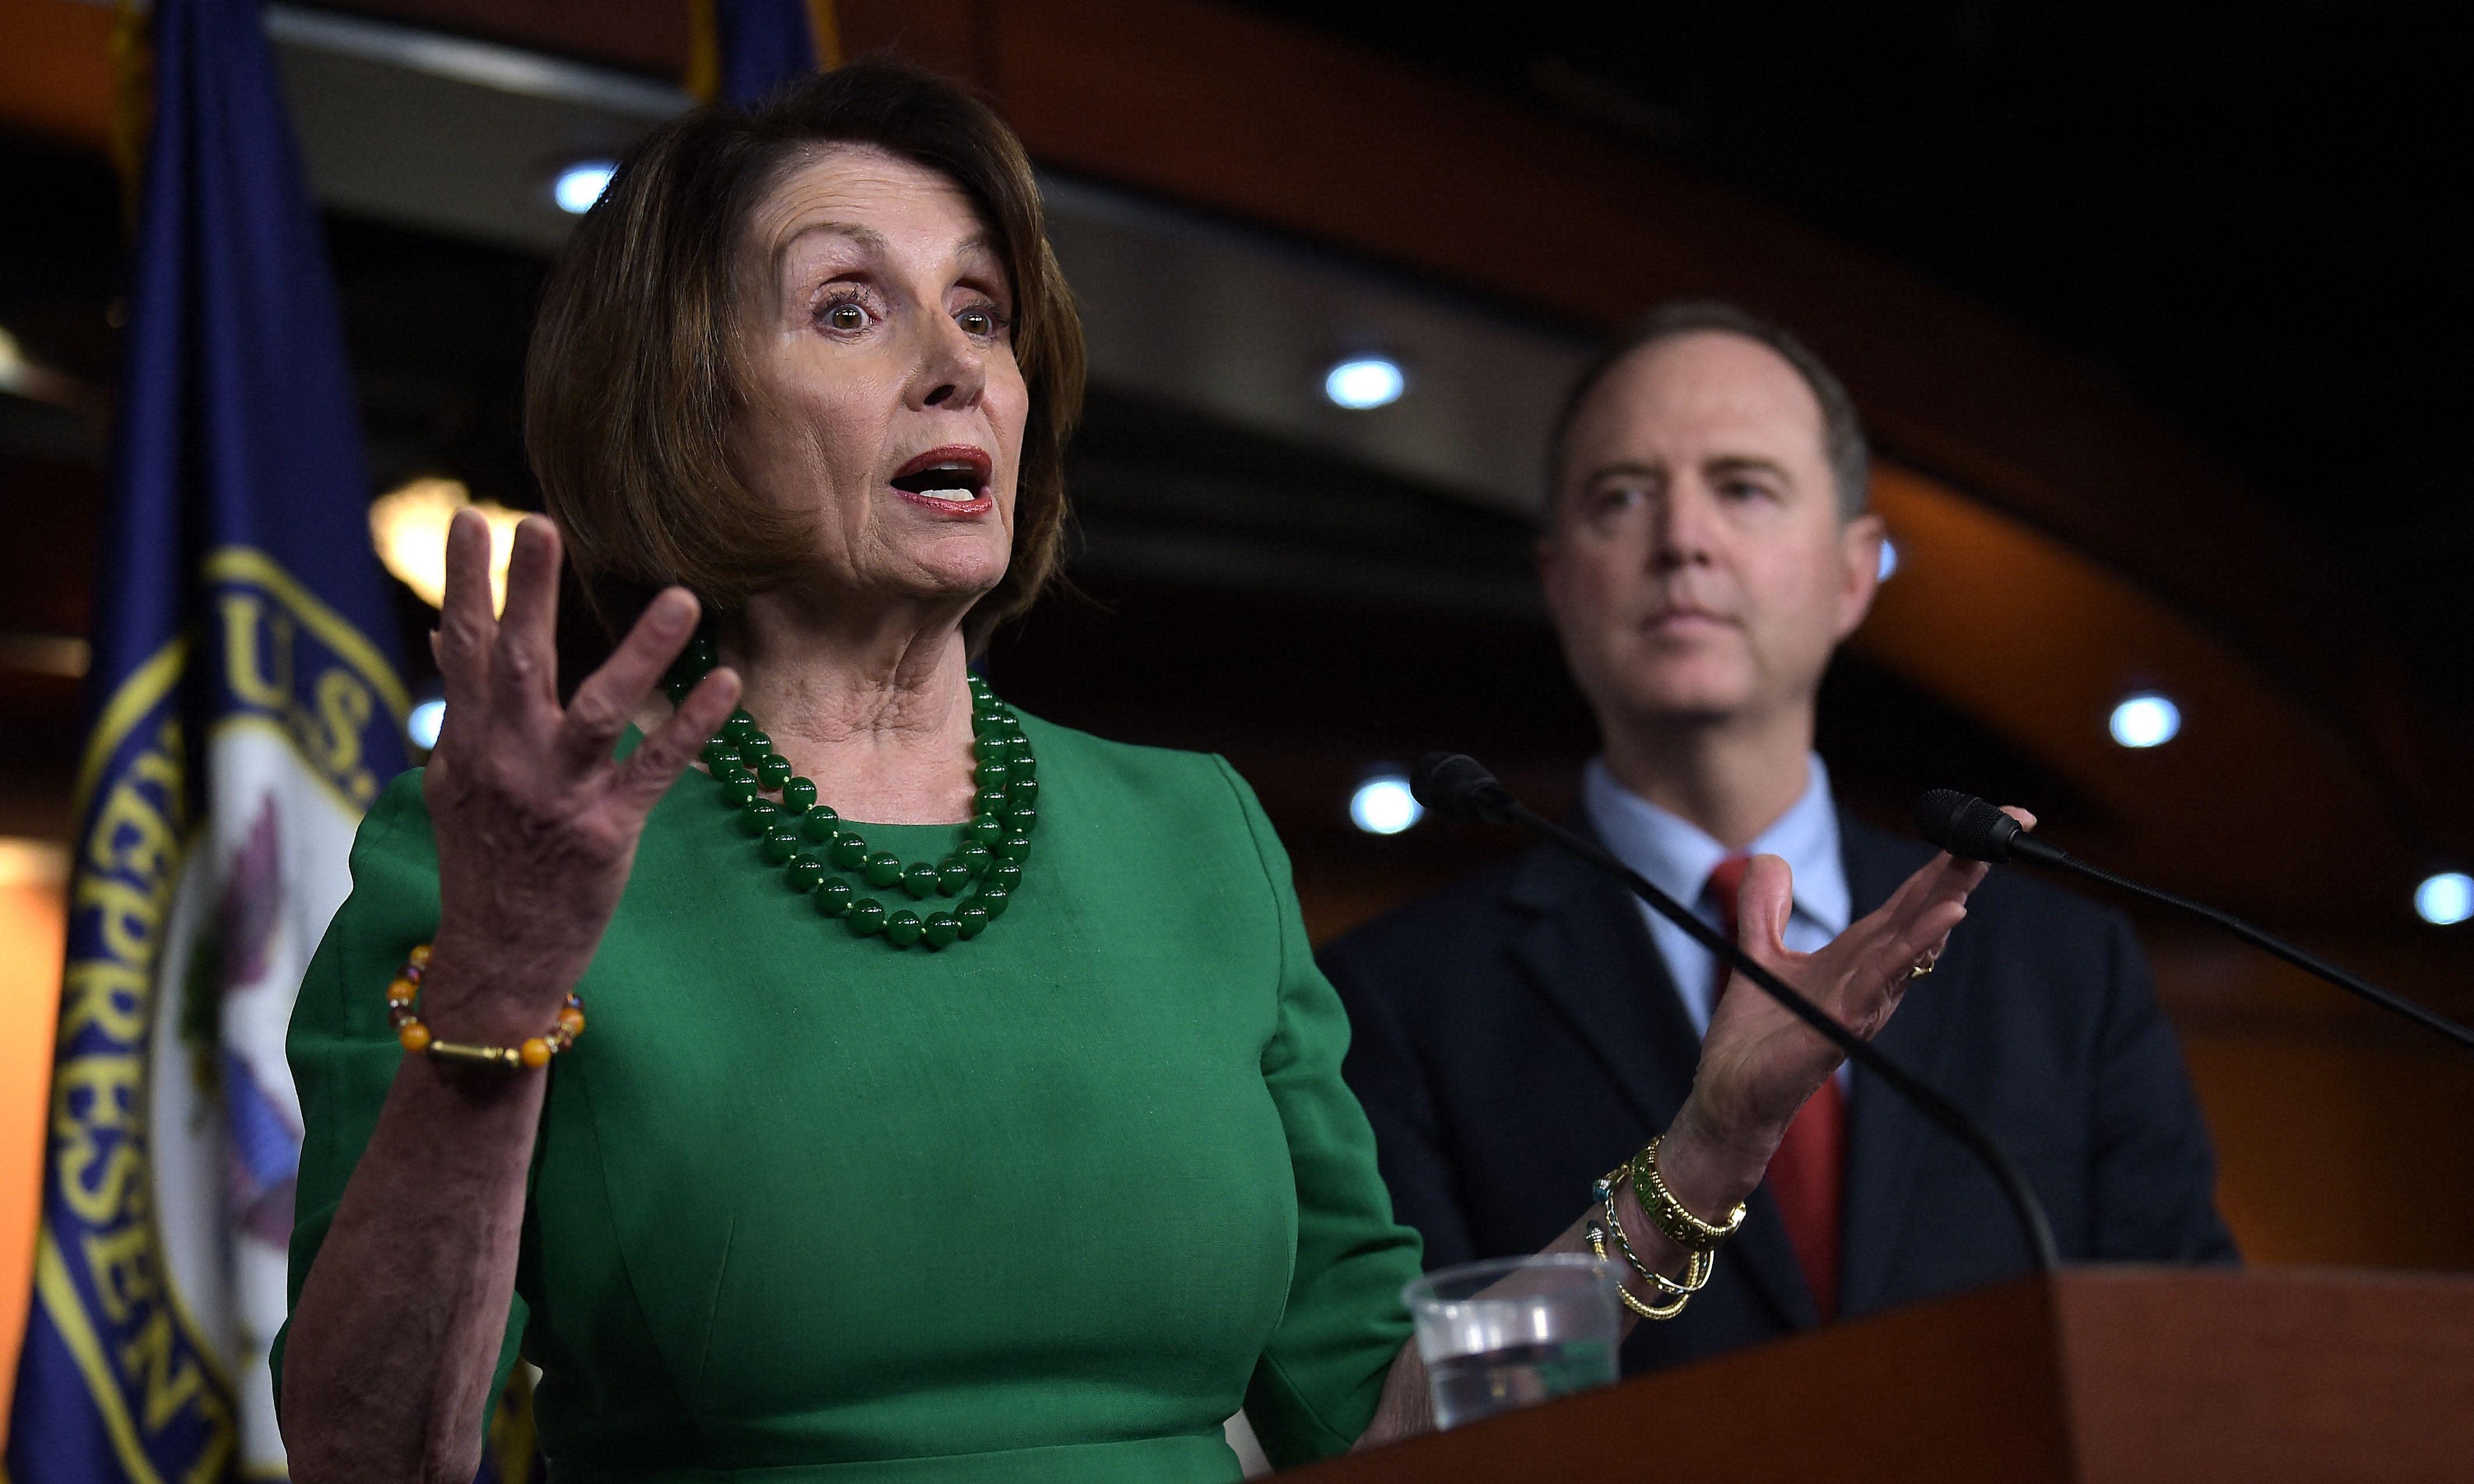 Pelosi: 'beyond belief' that Trump DoJ chiefs didn't know of secret subpoenas